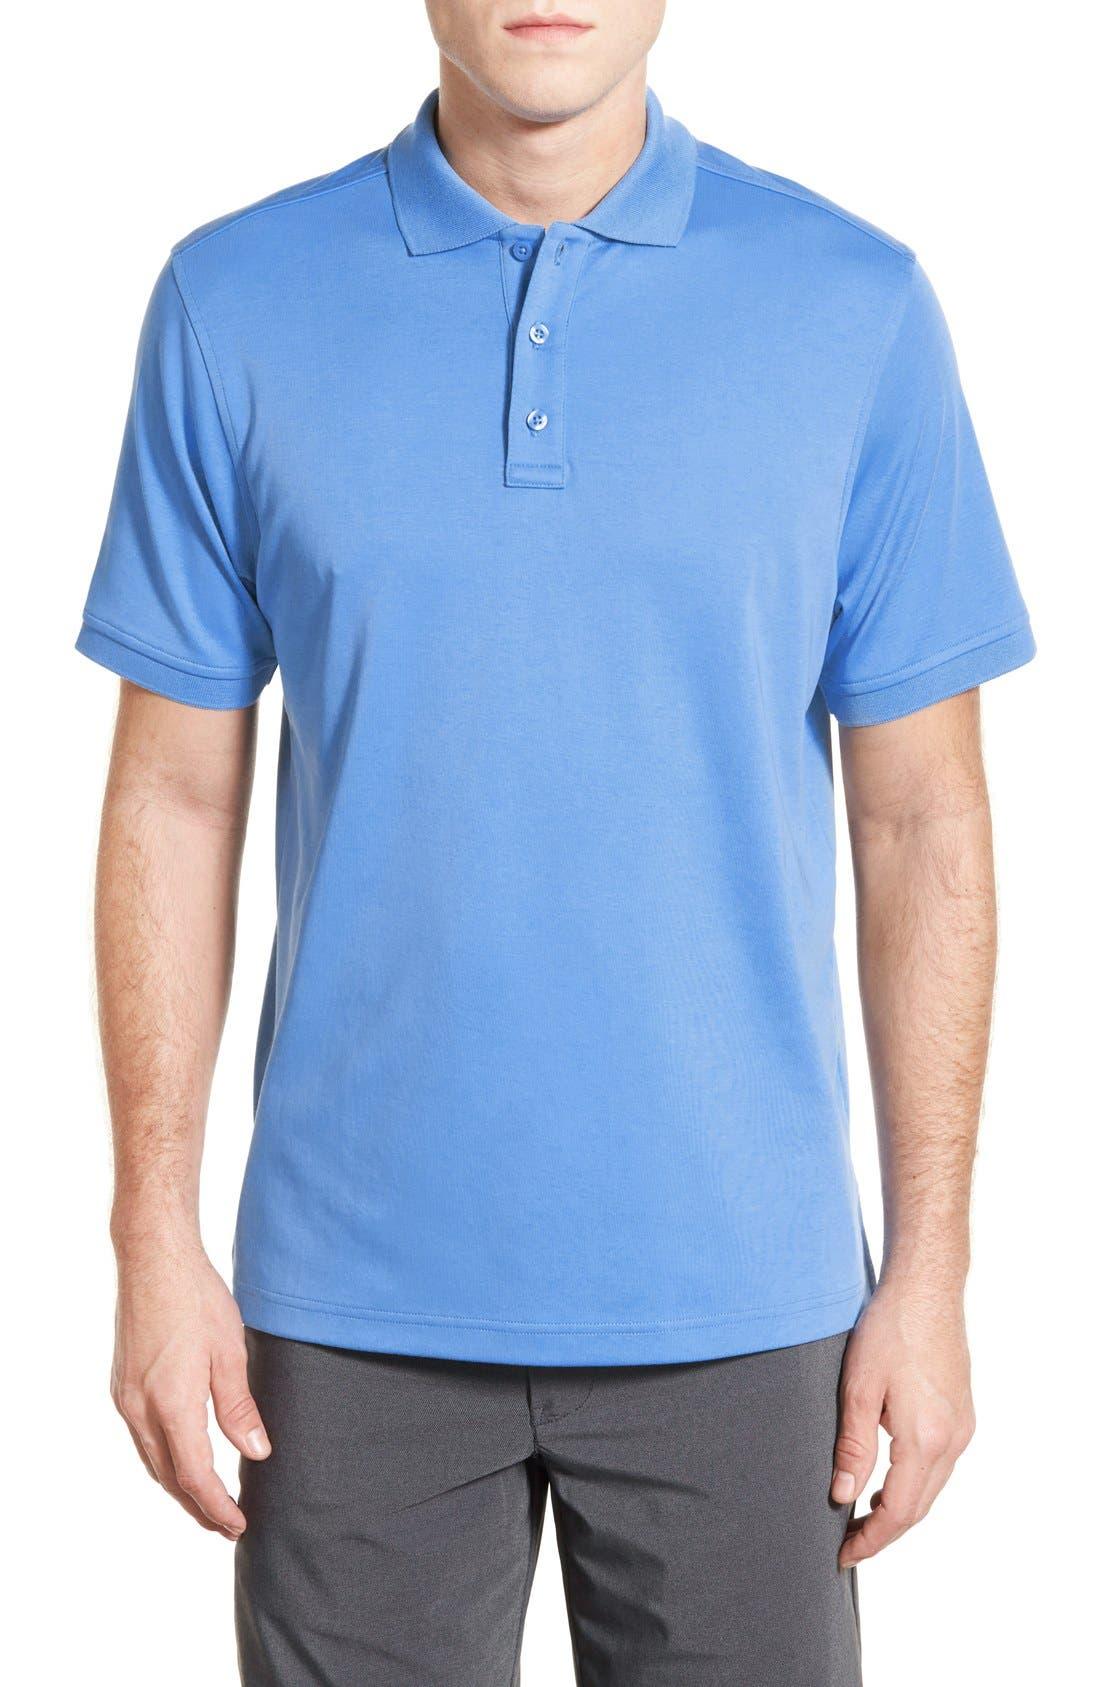 Main Image - Nordstrom Men's Shop Regular Fit Interlock Knit Polo